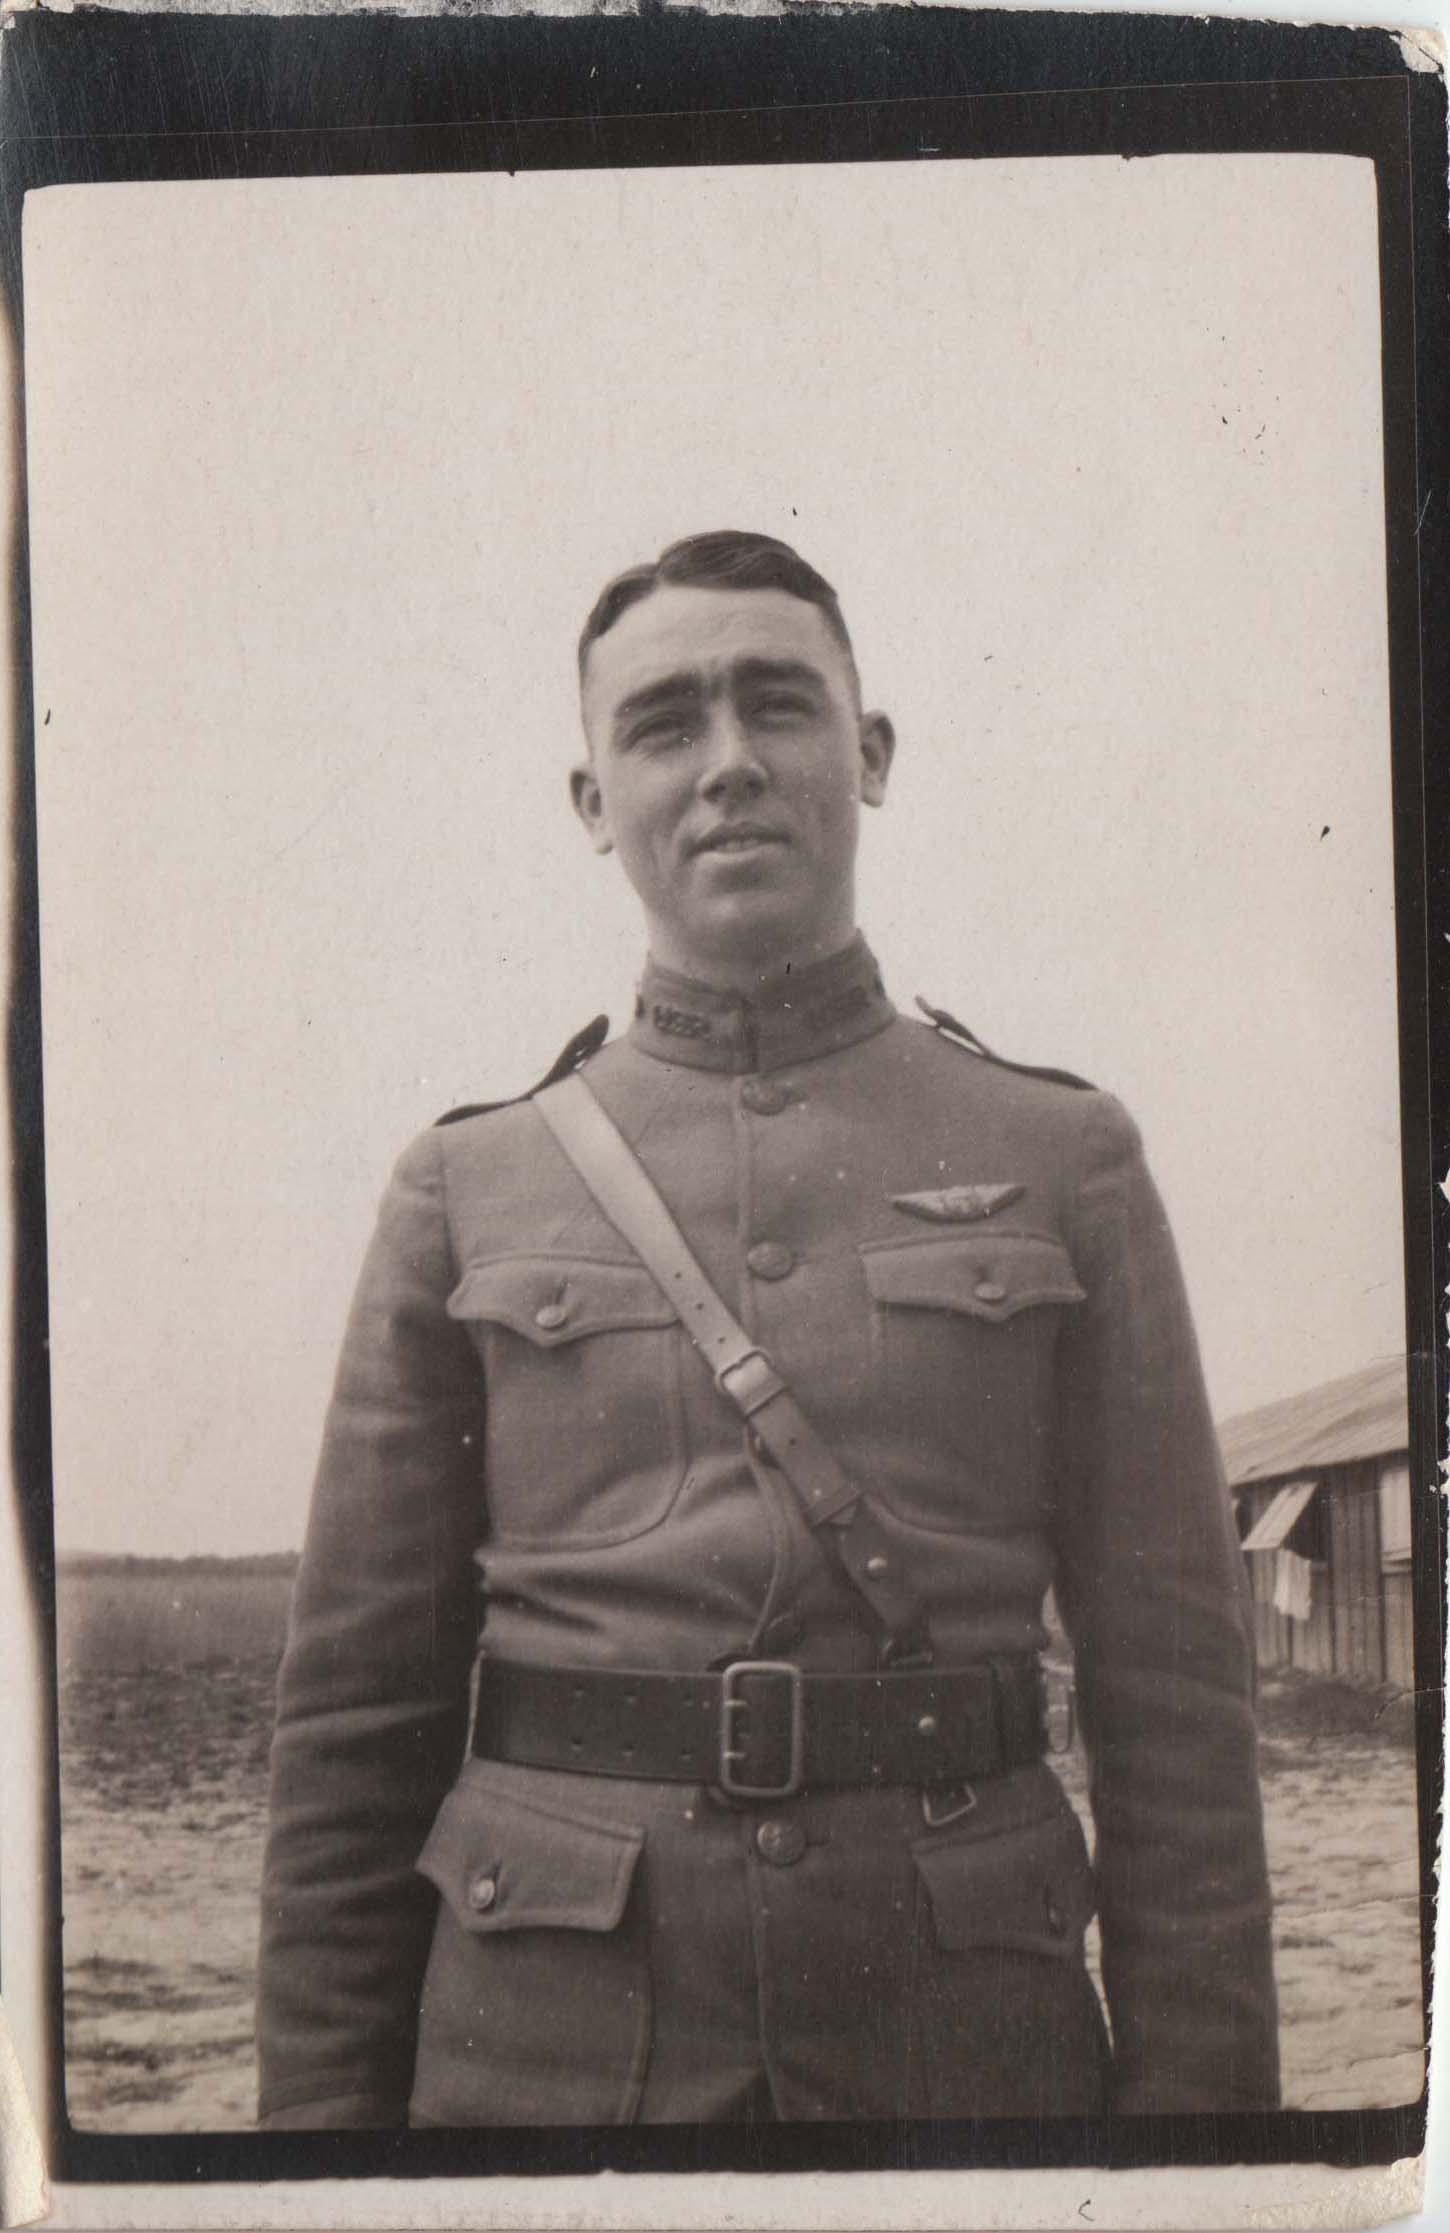 0440 Man in Uniform